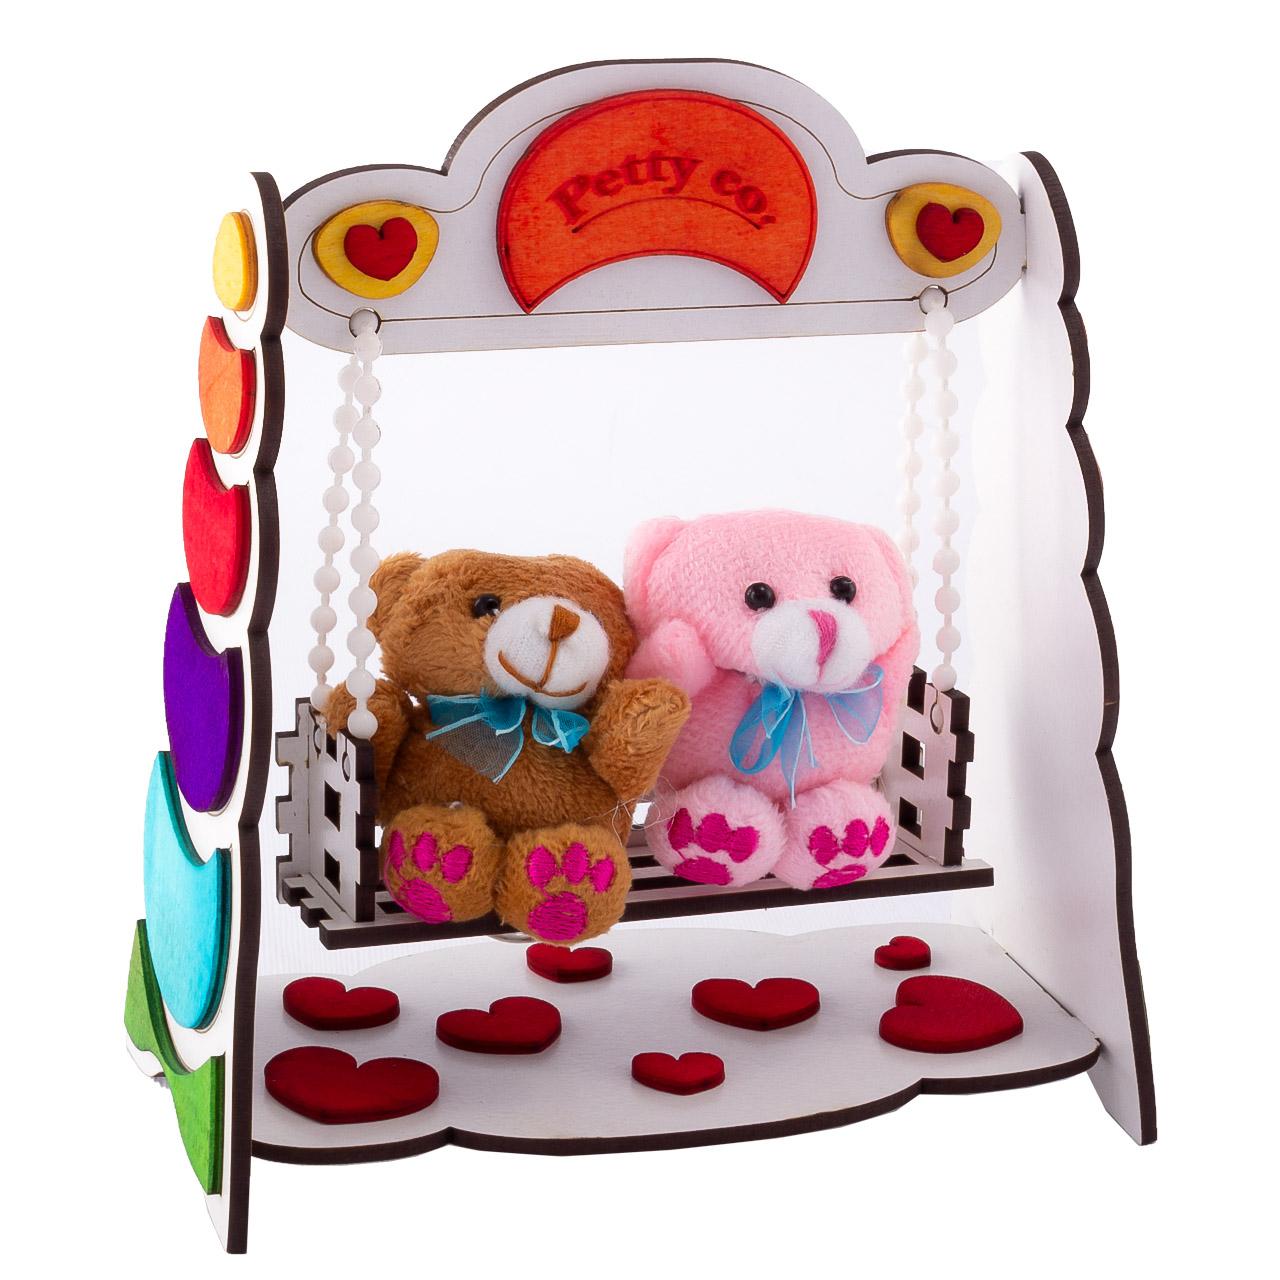 ماکت دکوری تاب پتیکو مدل Lovely Swing به همراه 2 عروسک آویز